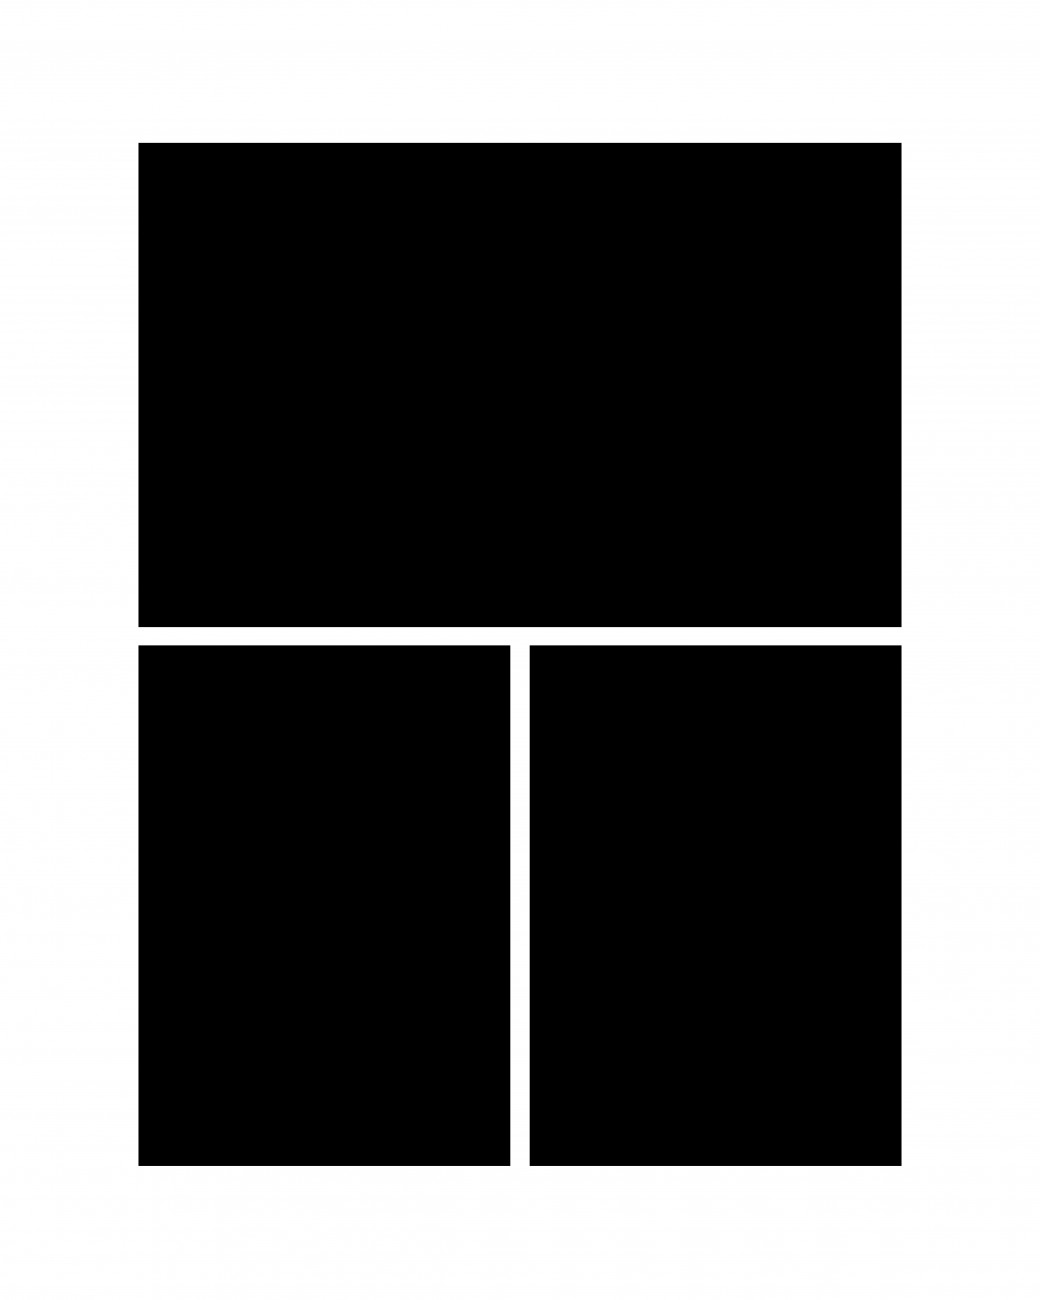 40x50 cm 05 - 3 bilder